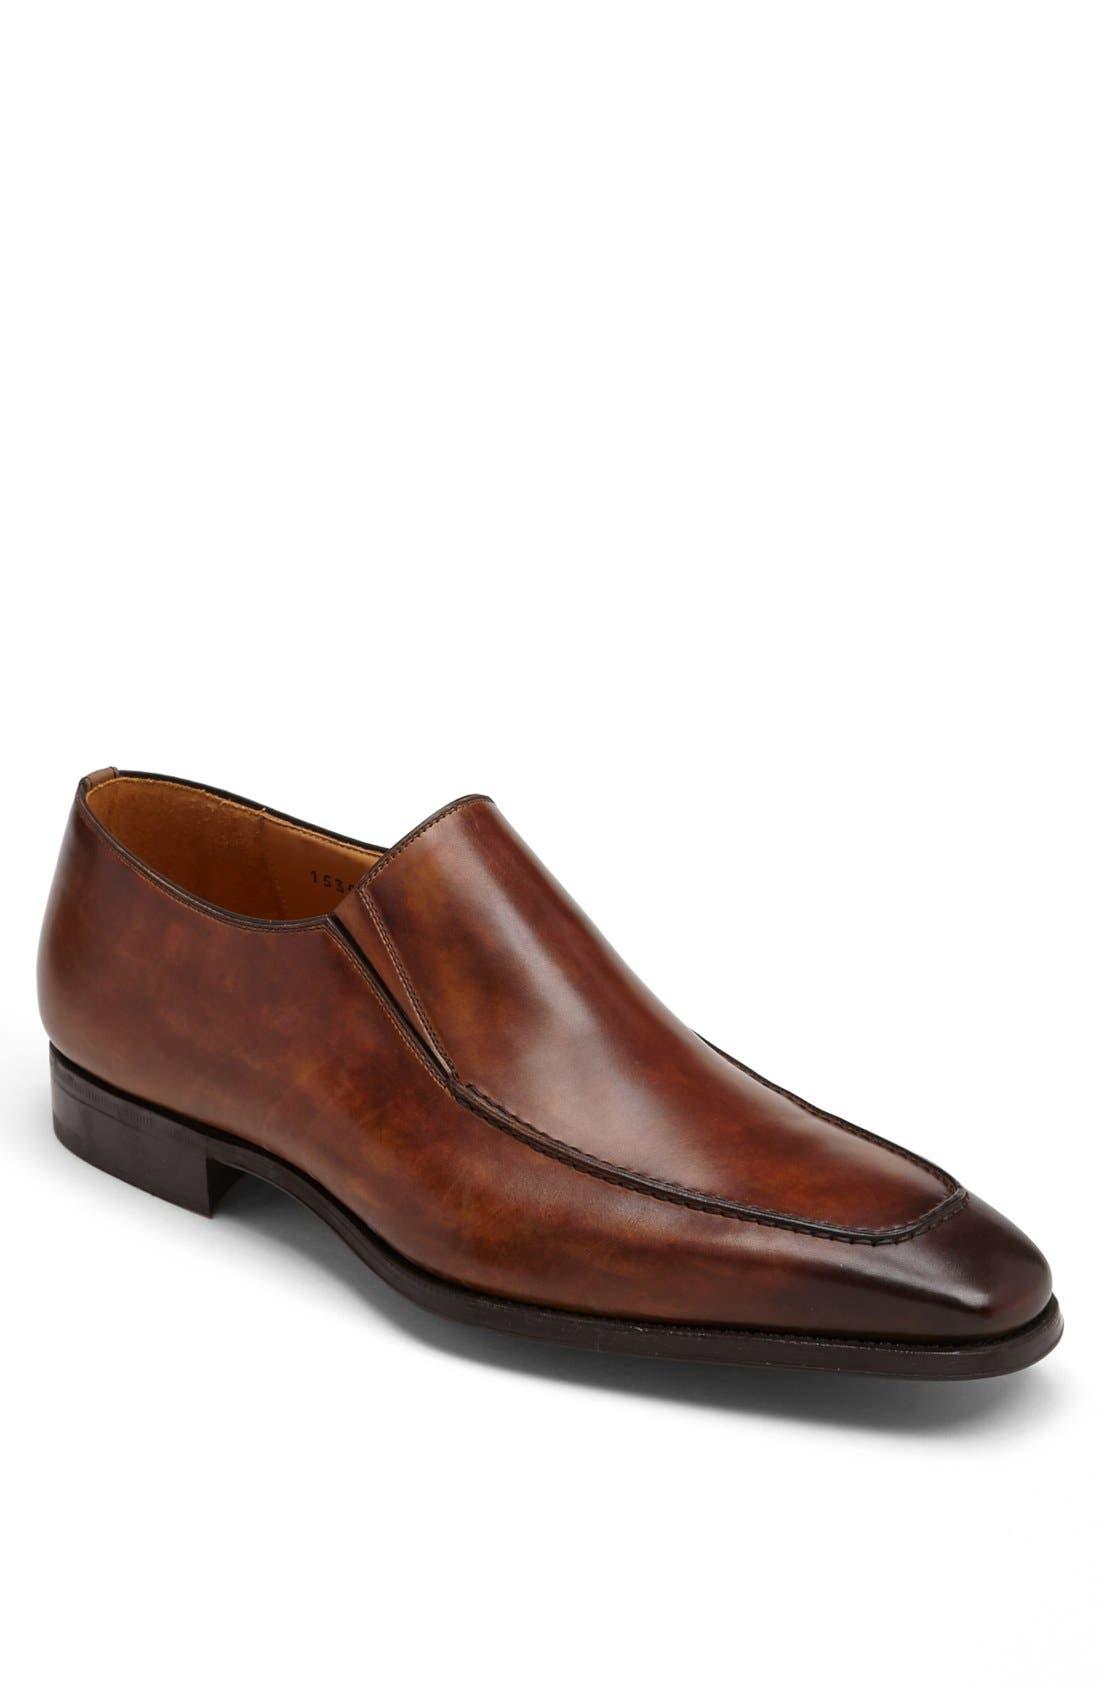 Alternate Image 1 Selected - Magnanni 'Leo' Venetian Loafer